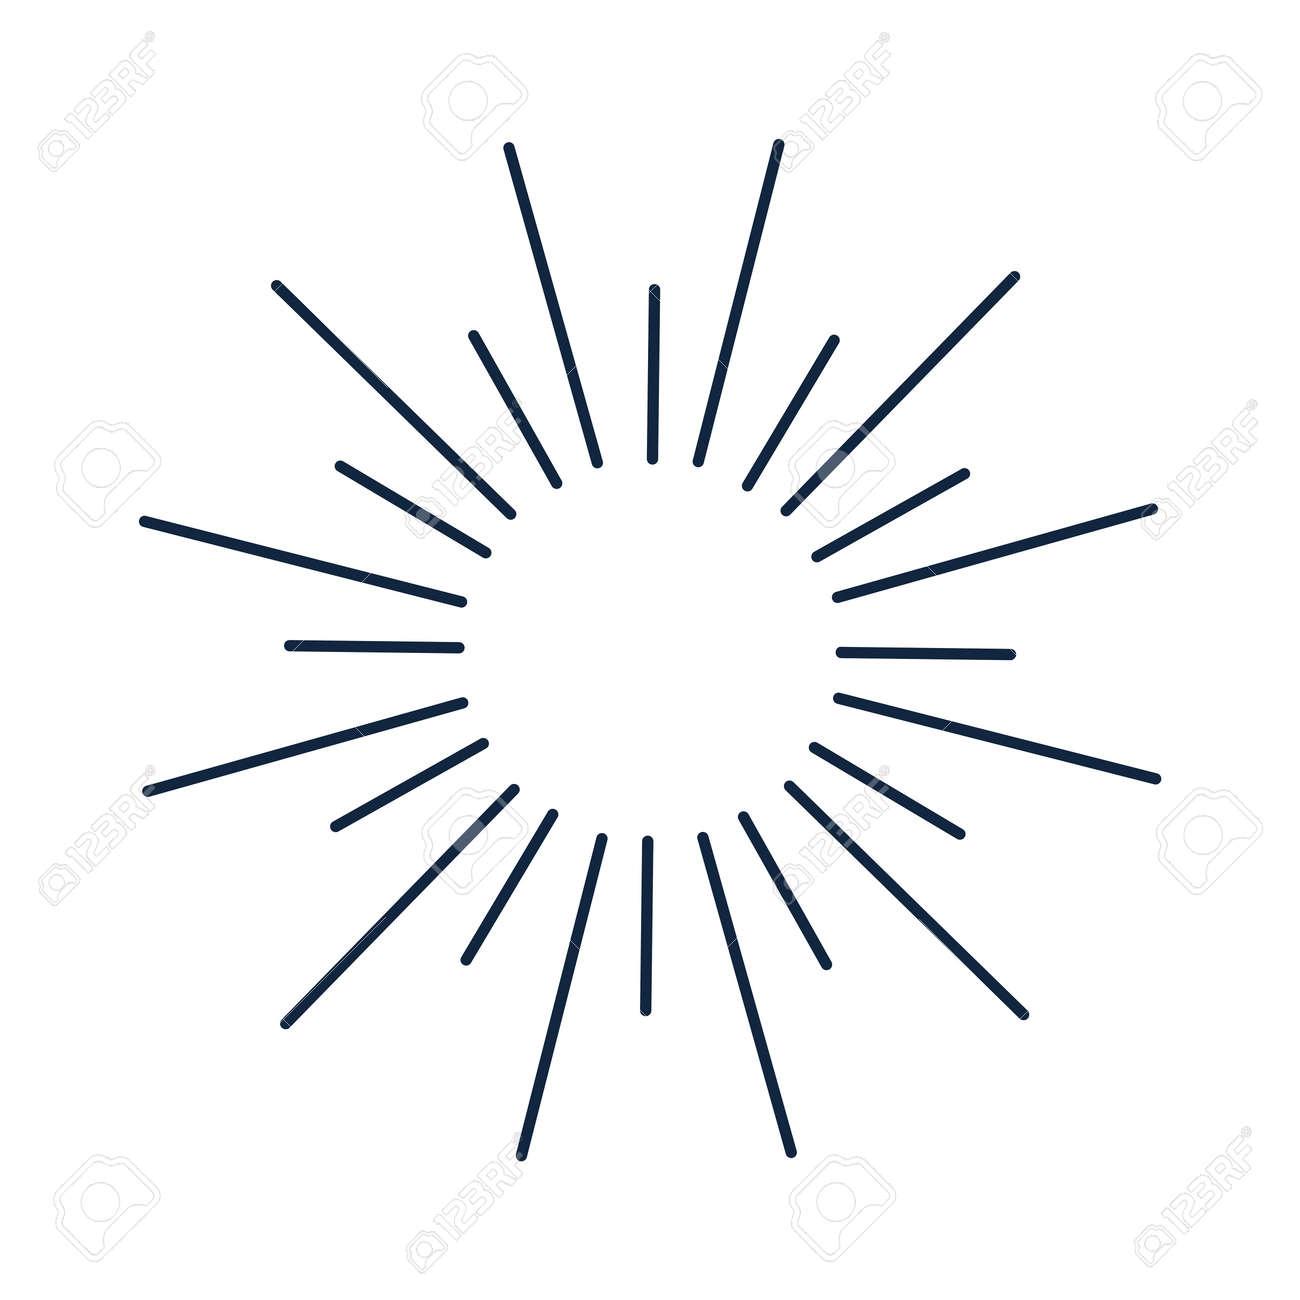 Sun Lines Shine Circle And Decorations Ray Sunburst Star Element Design